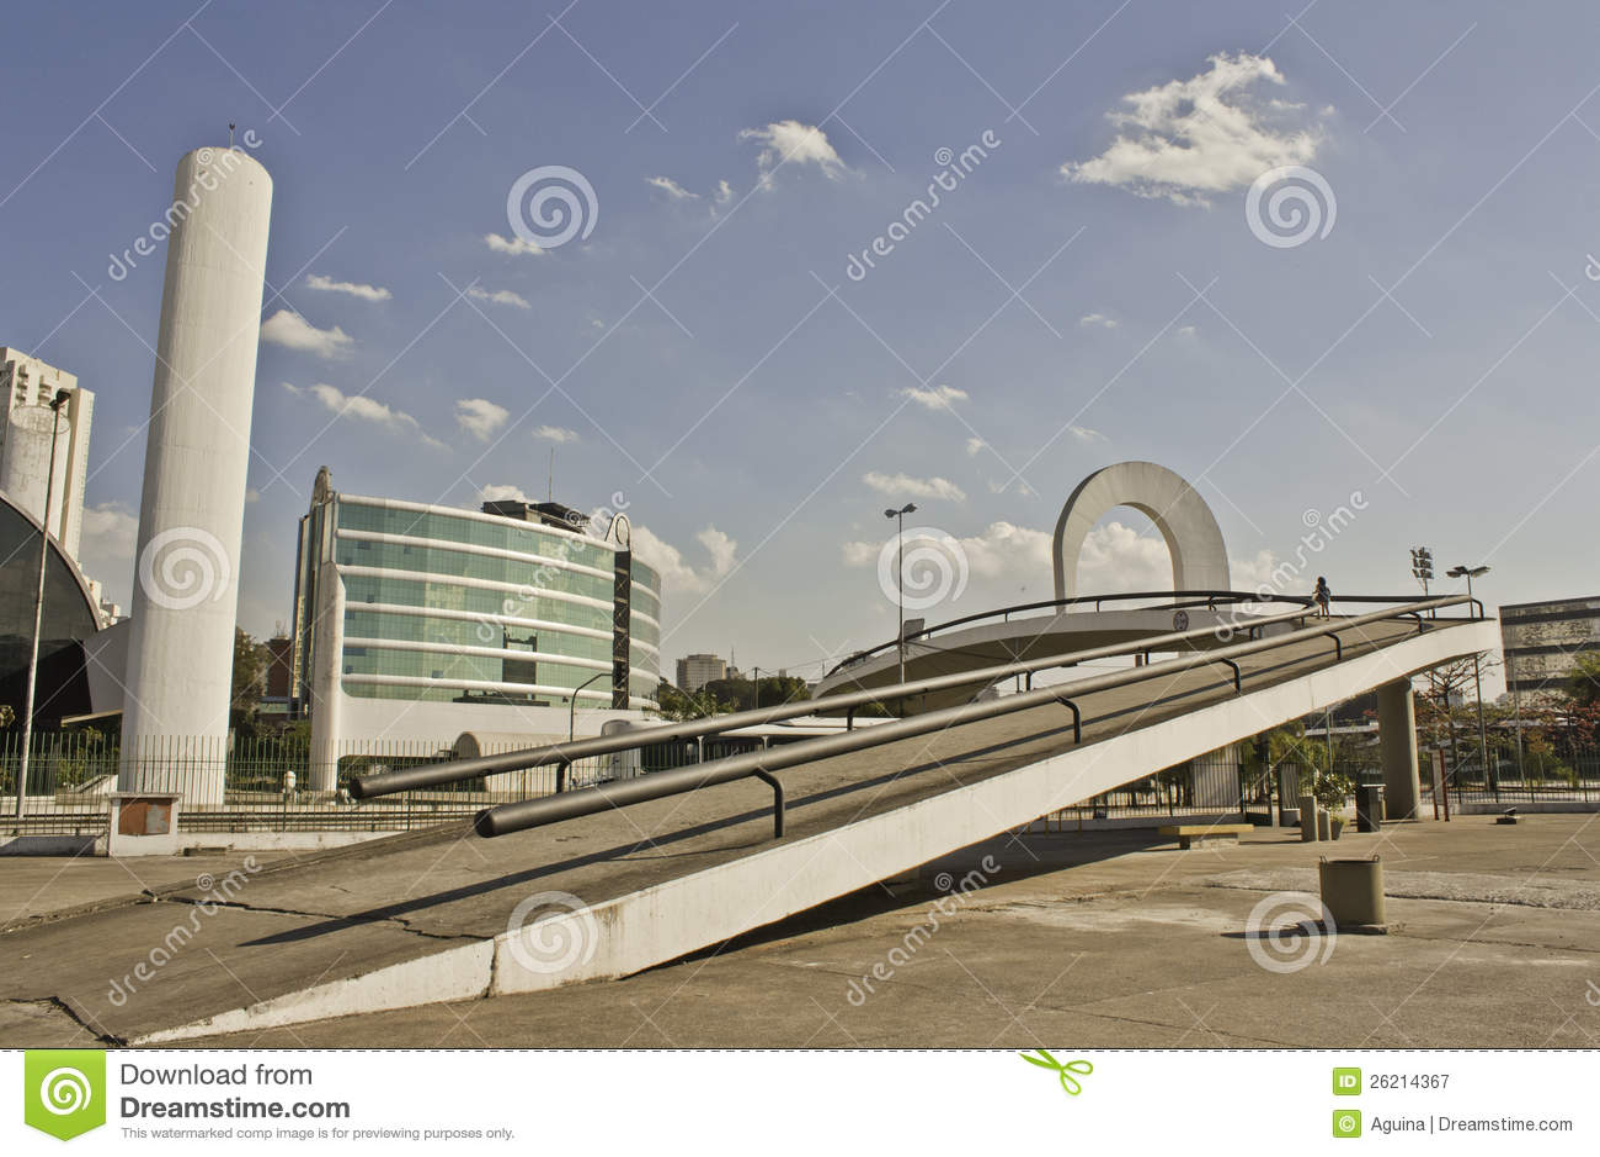 Monumento de América latina